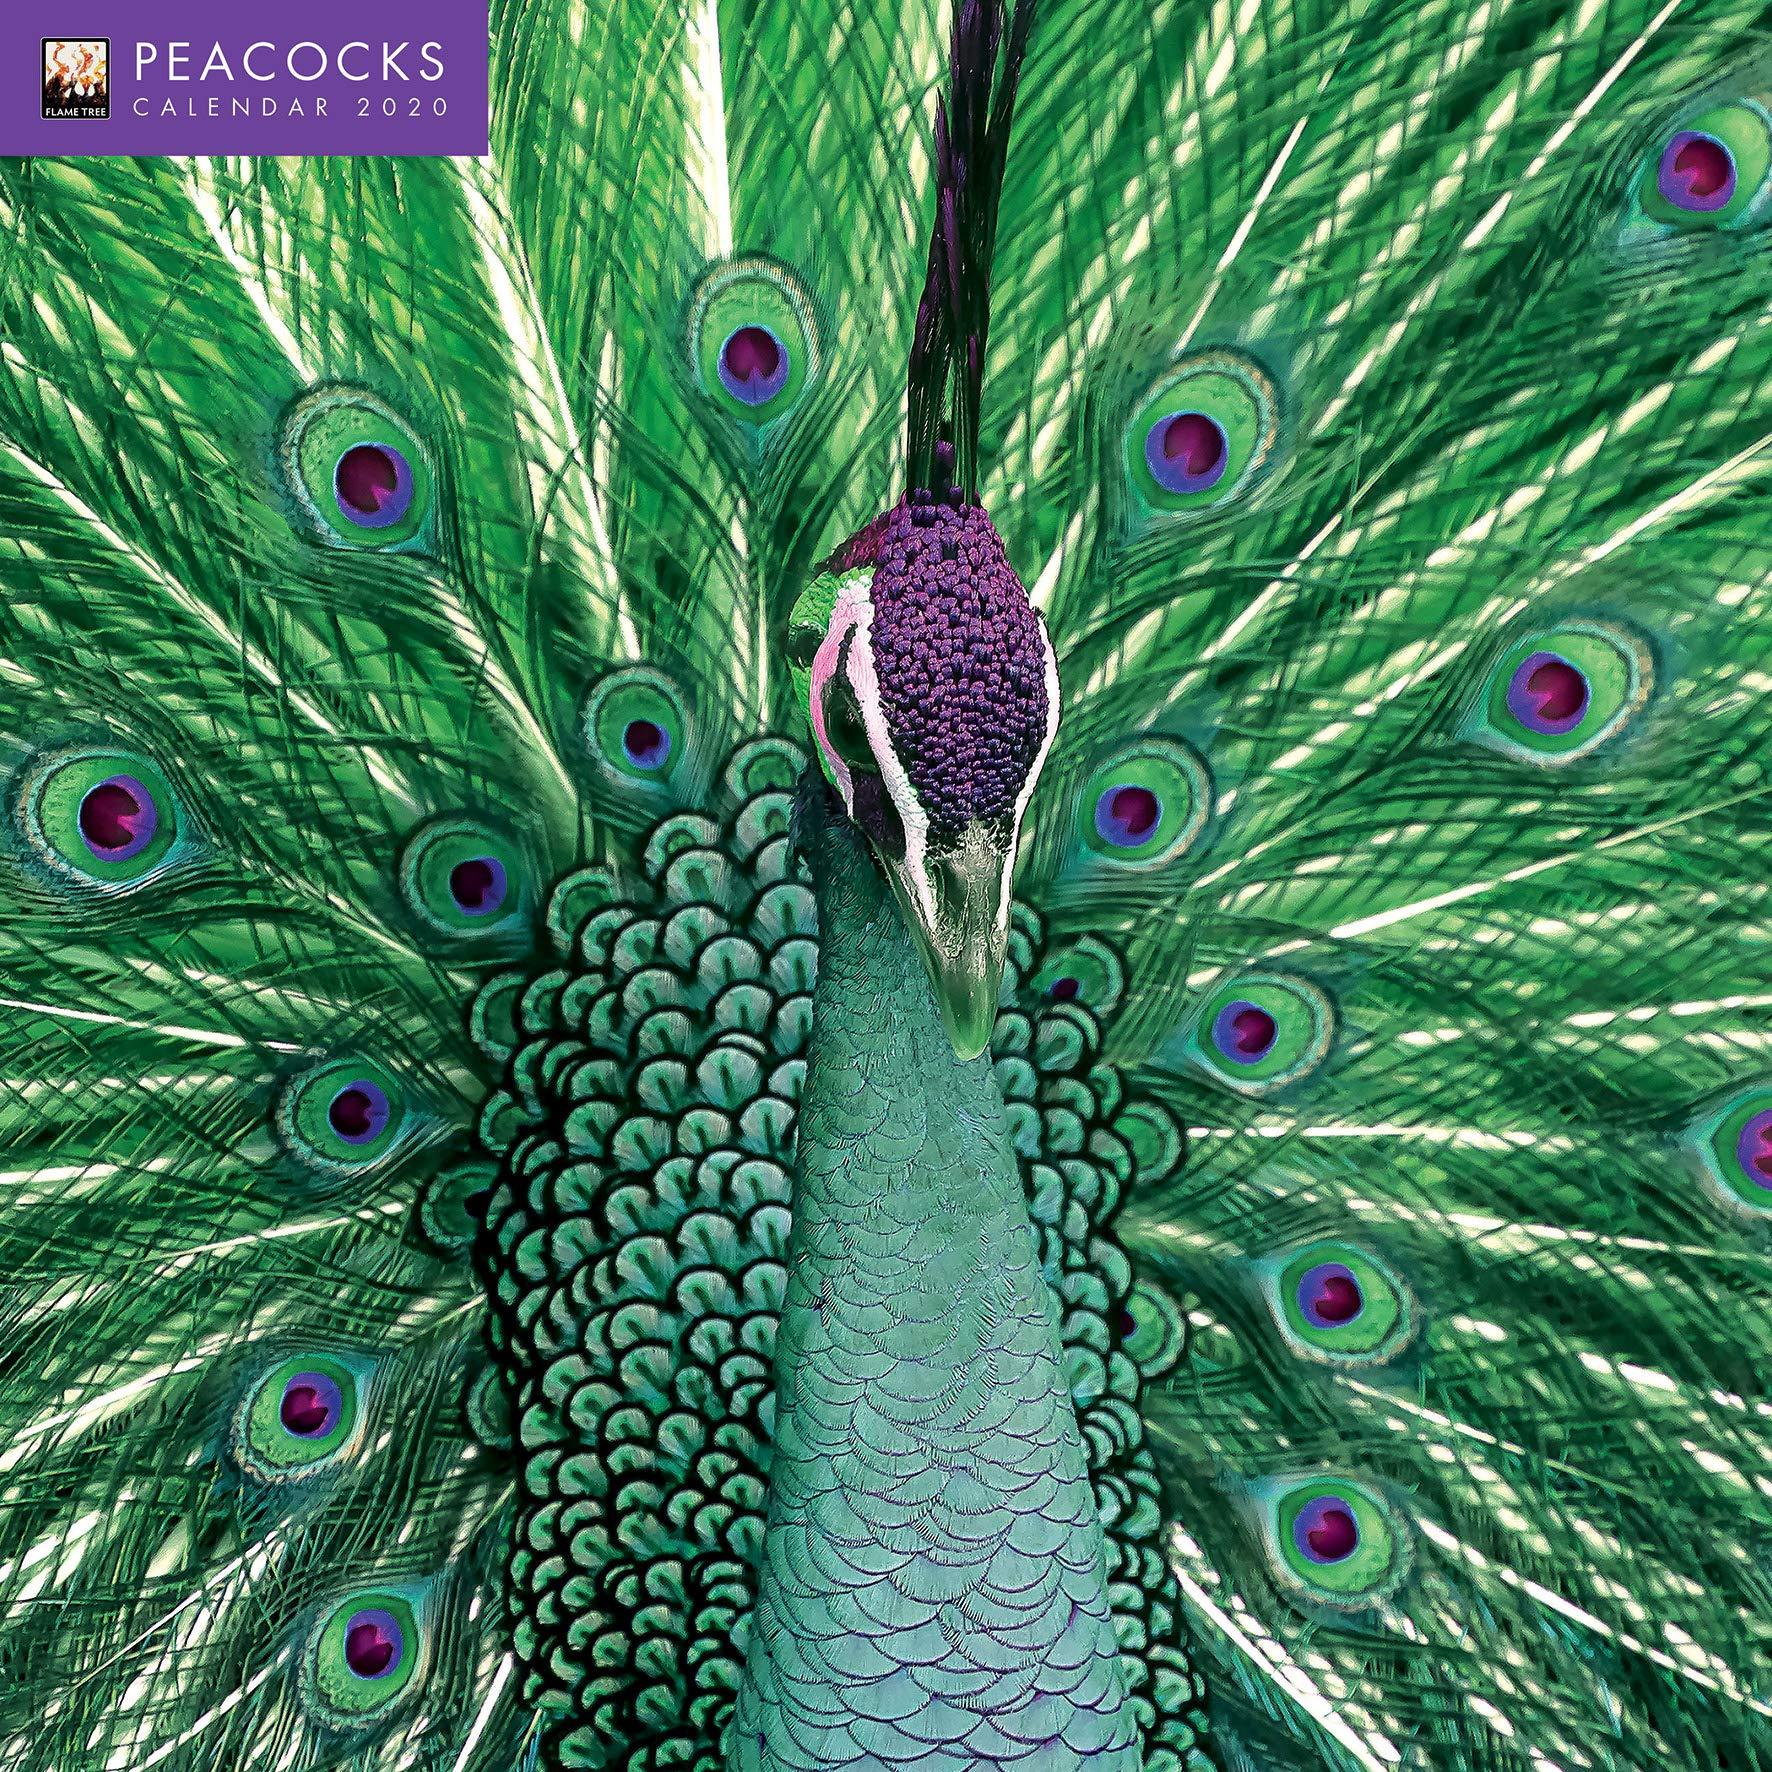 Peacocks Wall Calendar 2020 Art Calendar Flame Tree Studio 9781787553934 Amazon Com Books